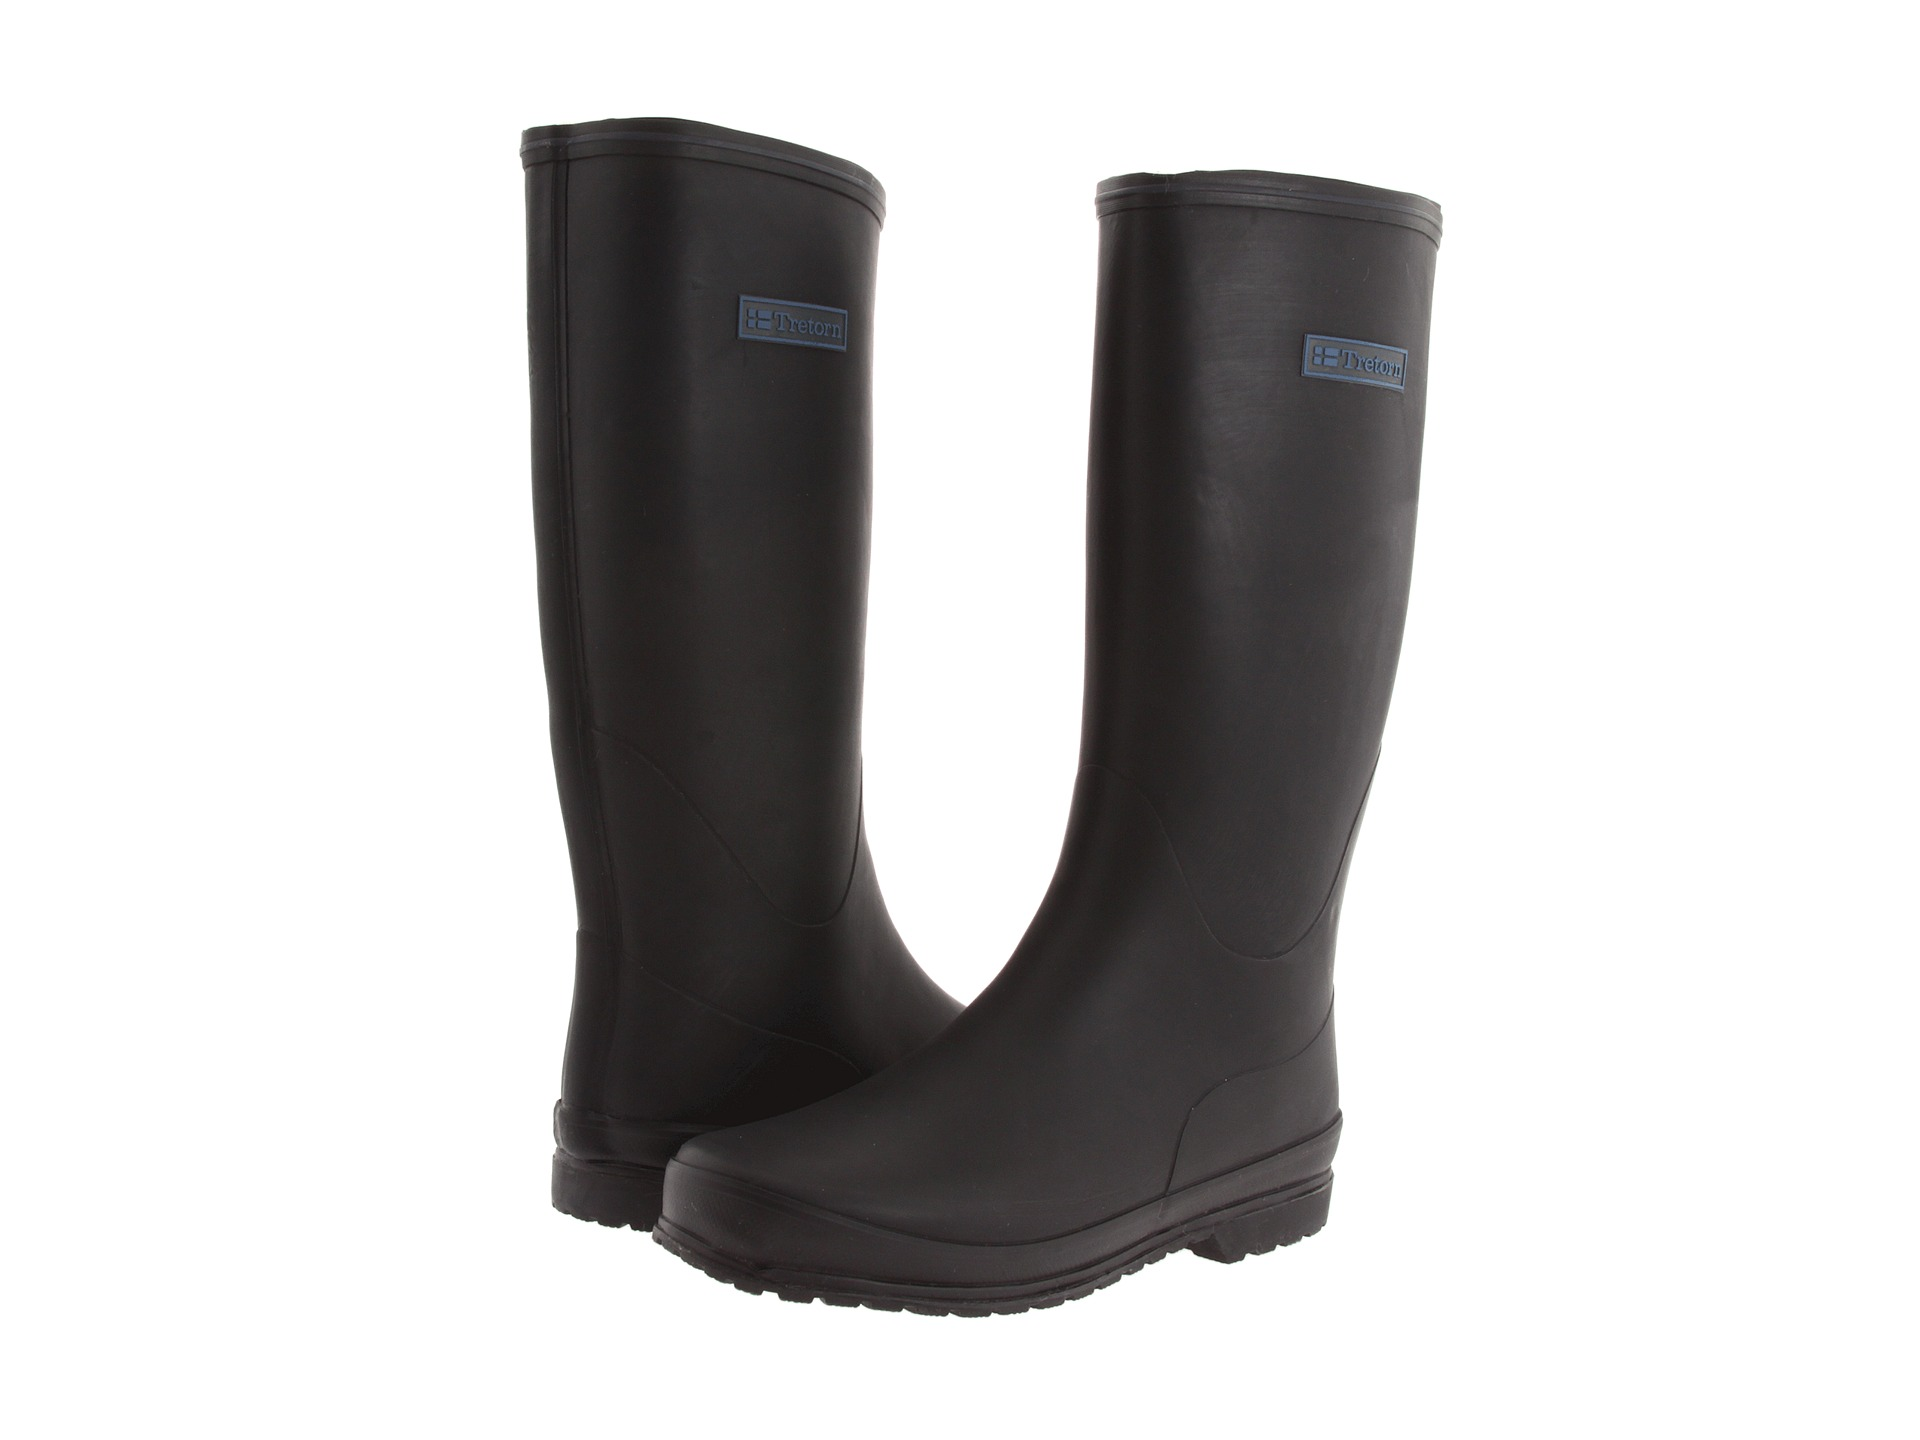 Rain Boots Rubber - Boot Hto